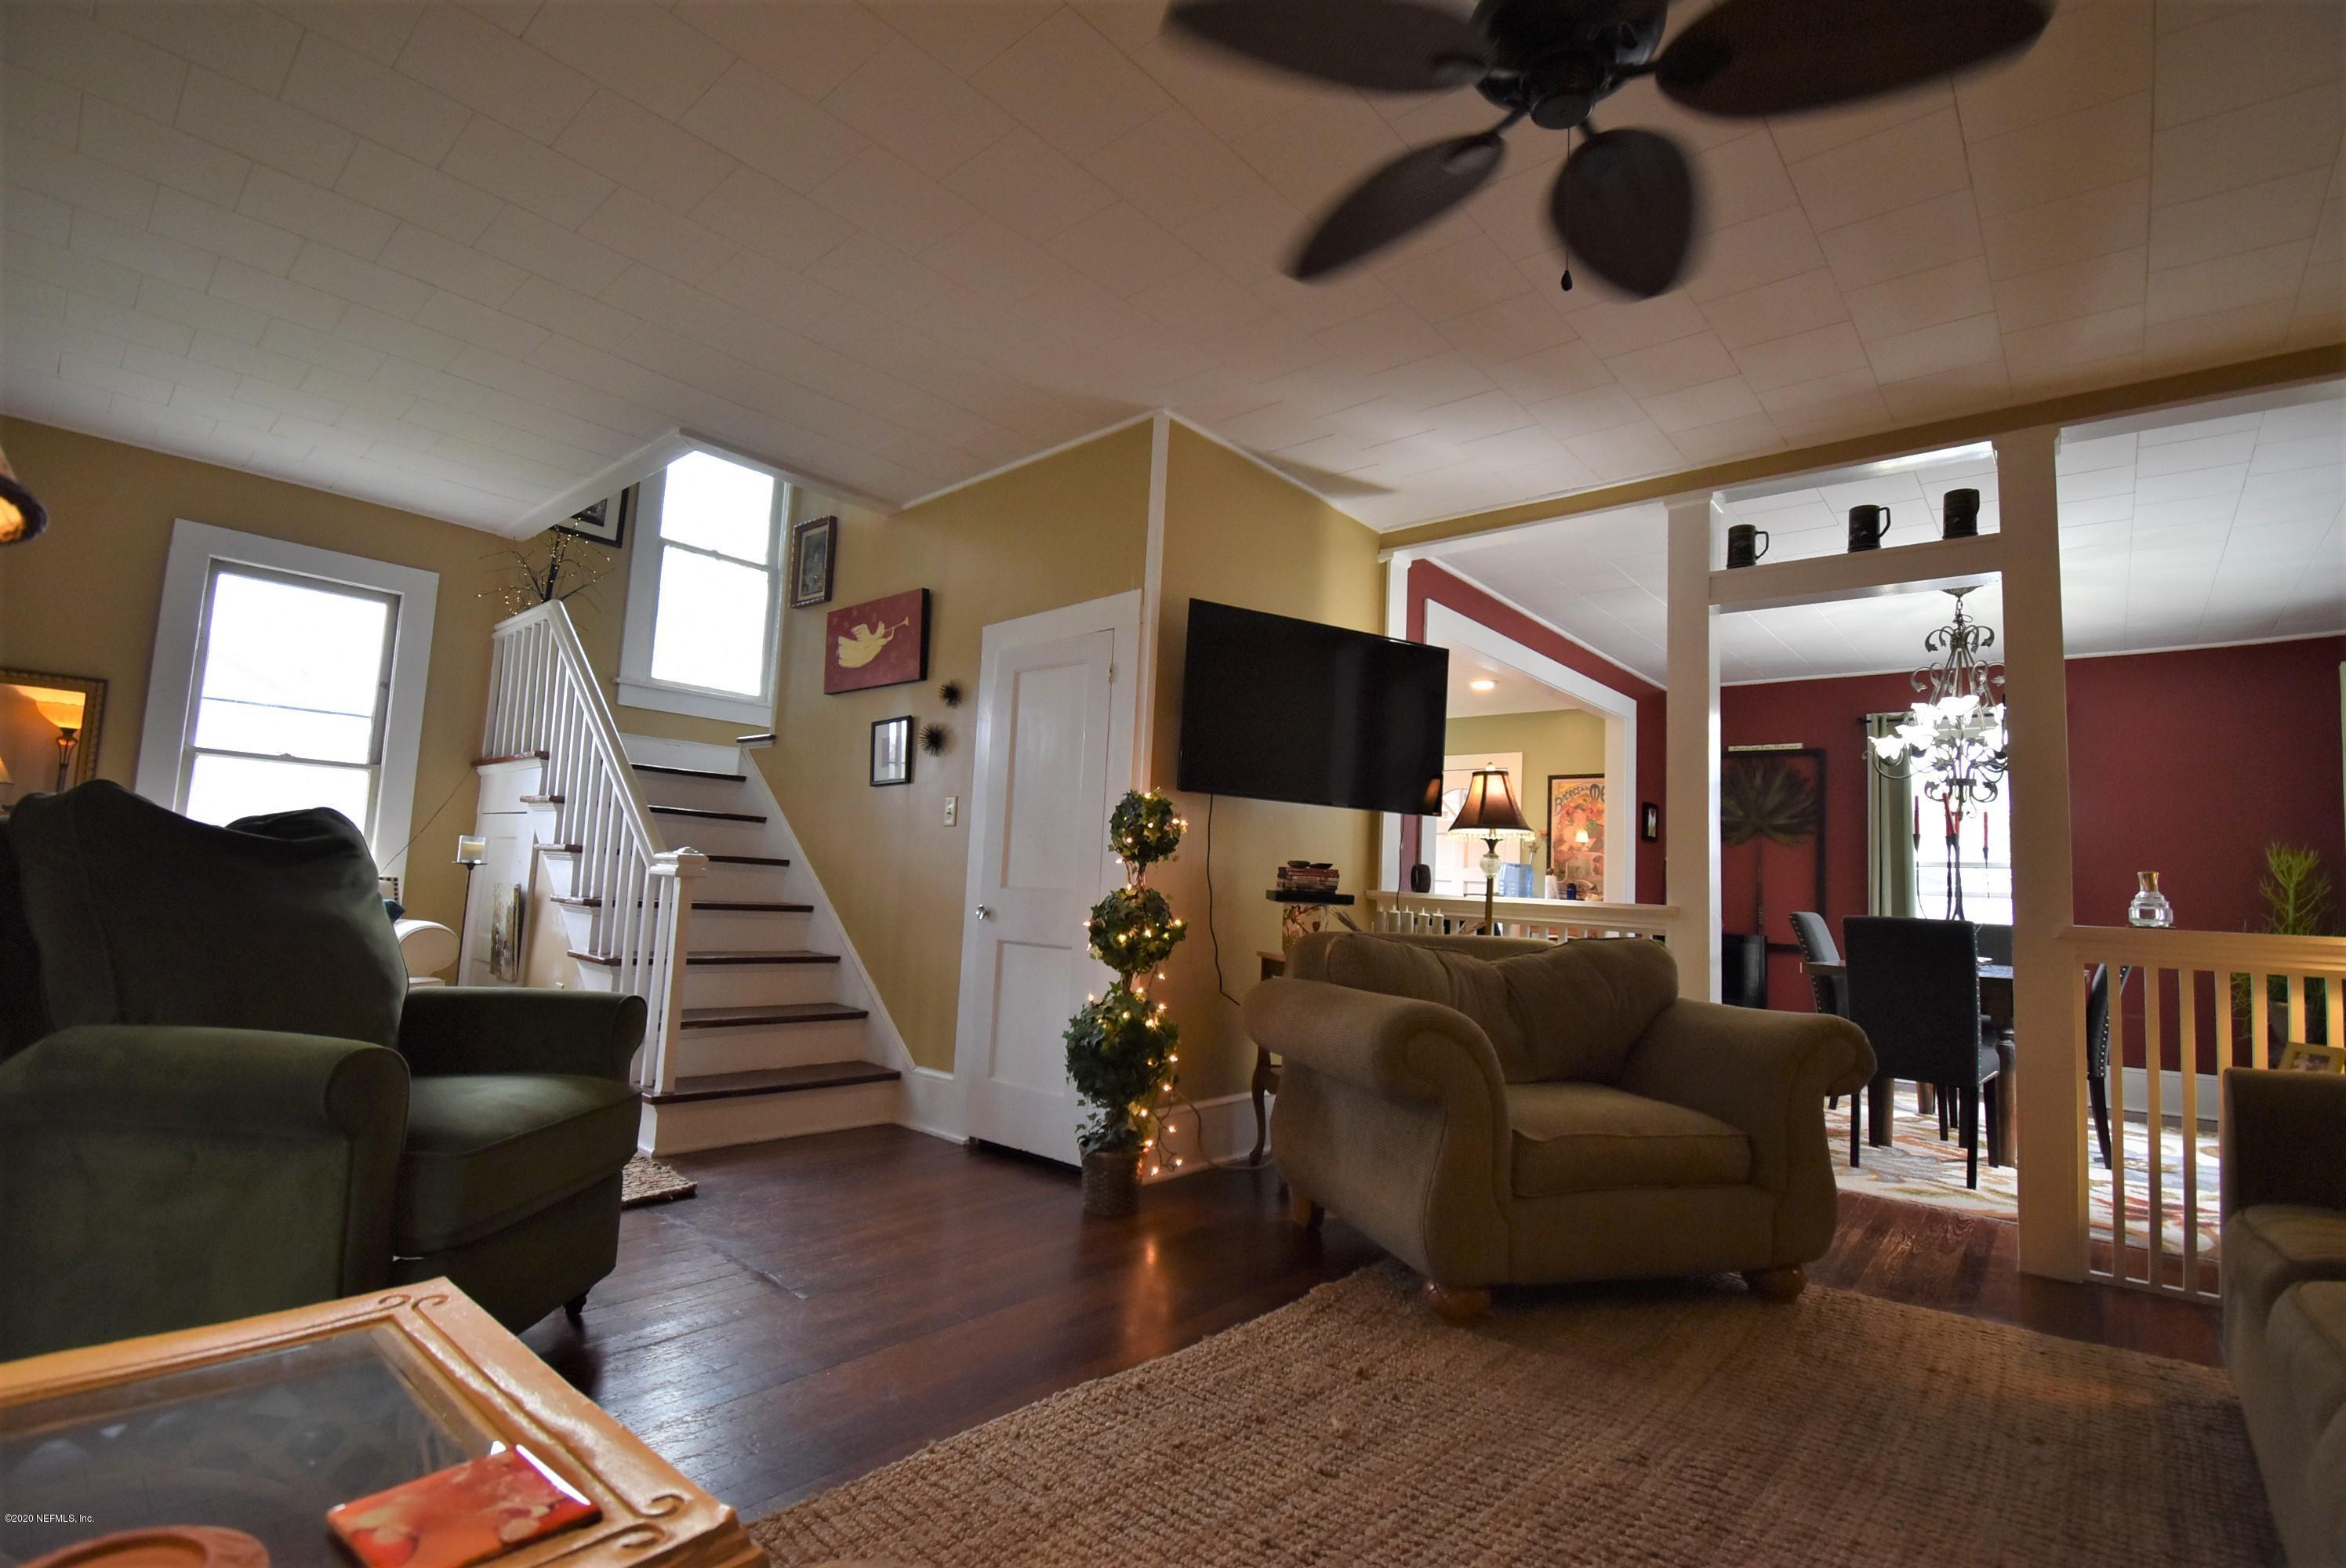 402 SUMMIT, CRESCENT CITY, FLORIDA 32112, 2 Bedrooms Bedrooms, ,2 BathroomsBathrooms,Residential,For sale,SUMMIT,1083834